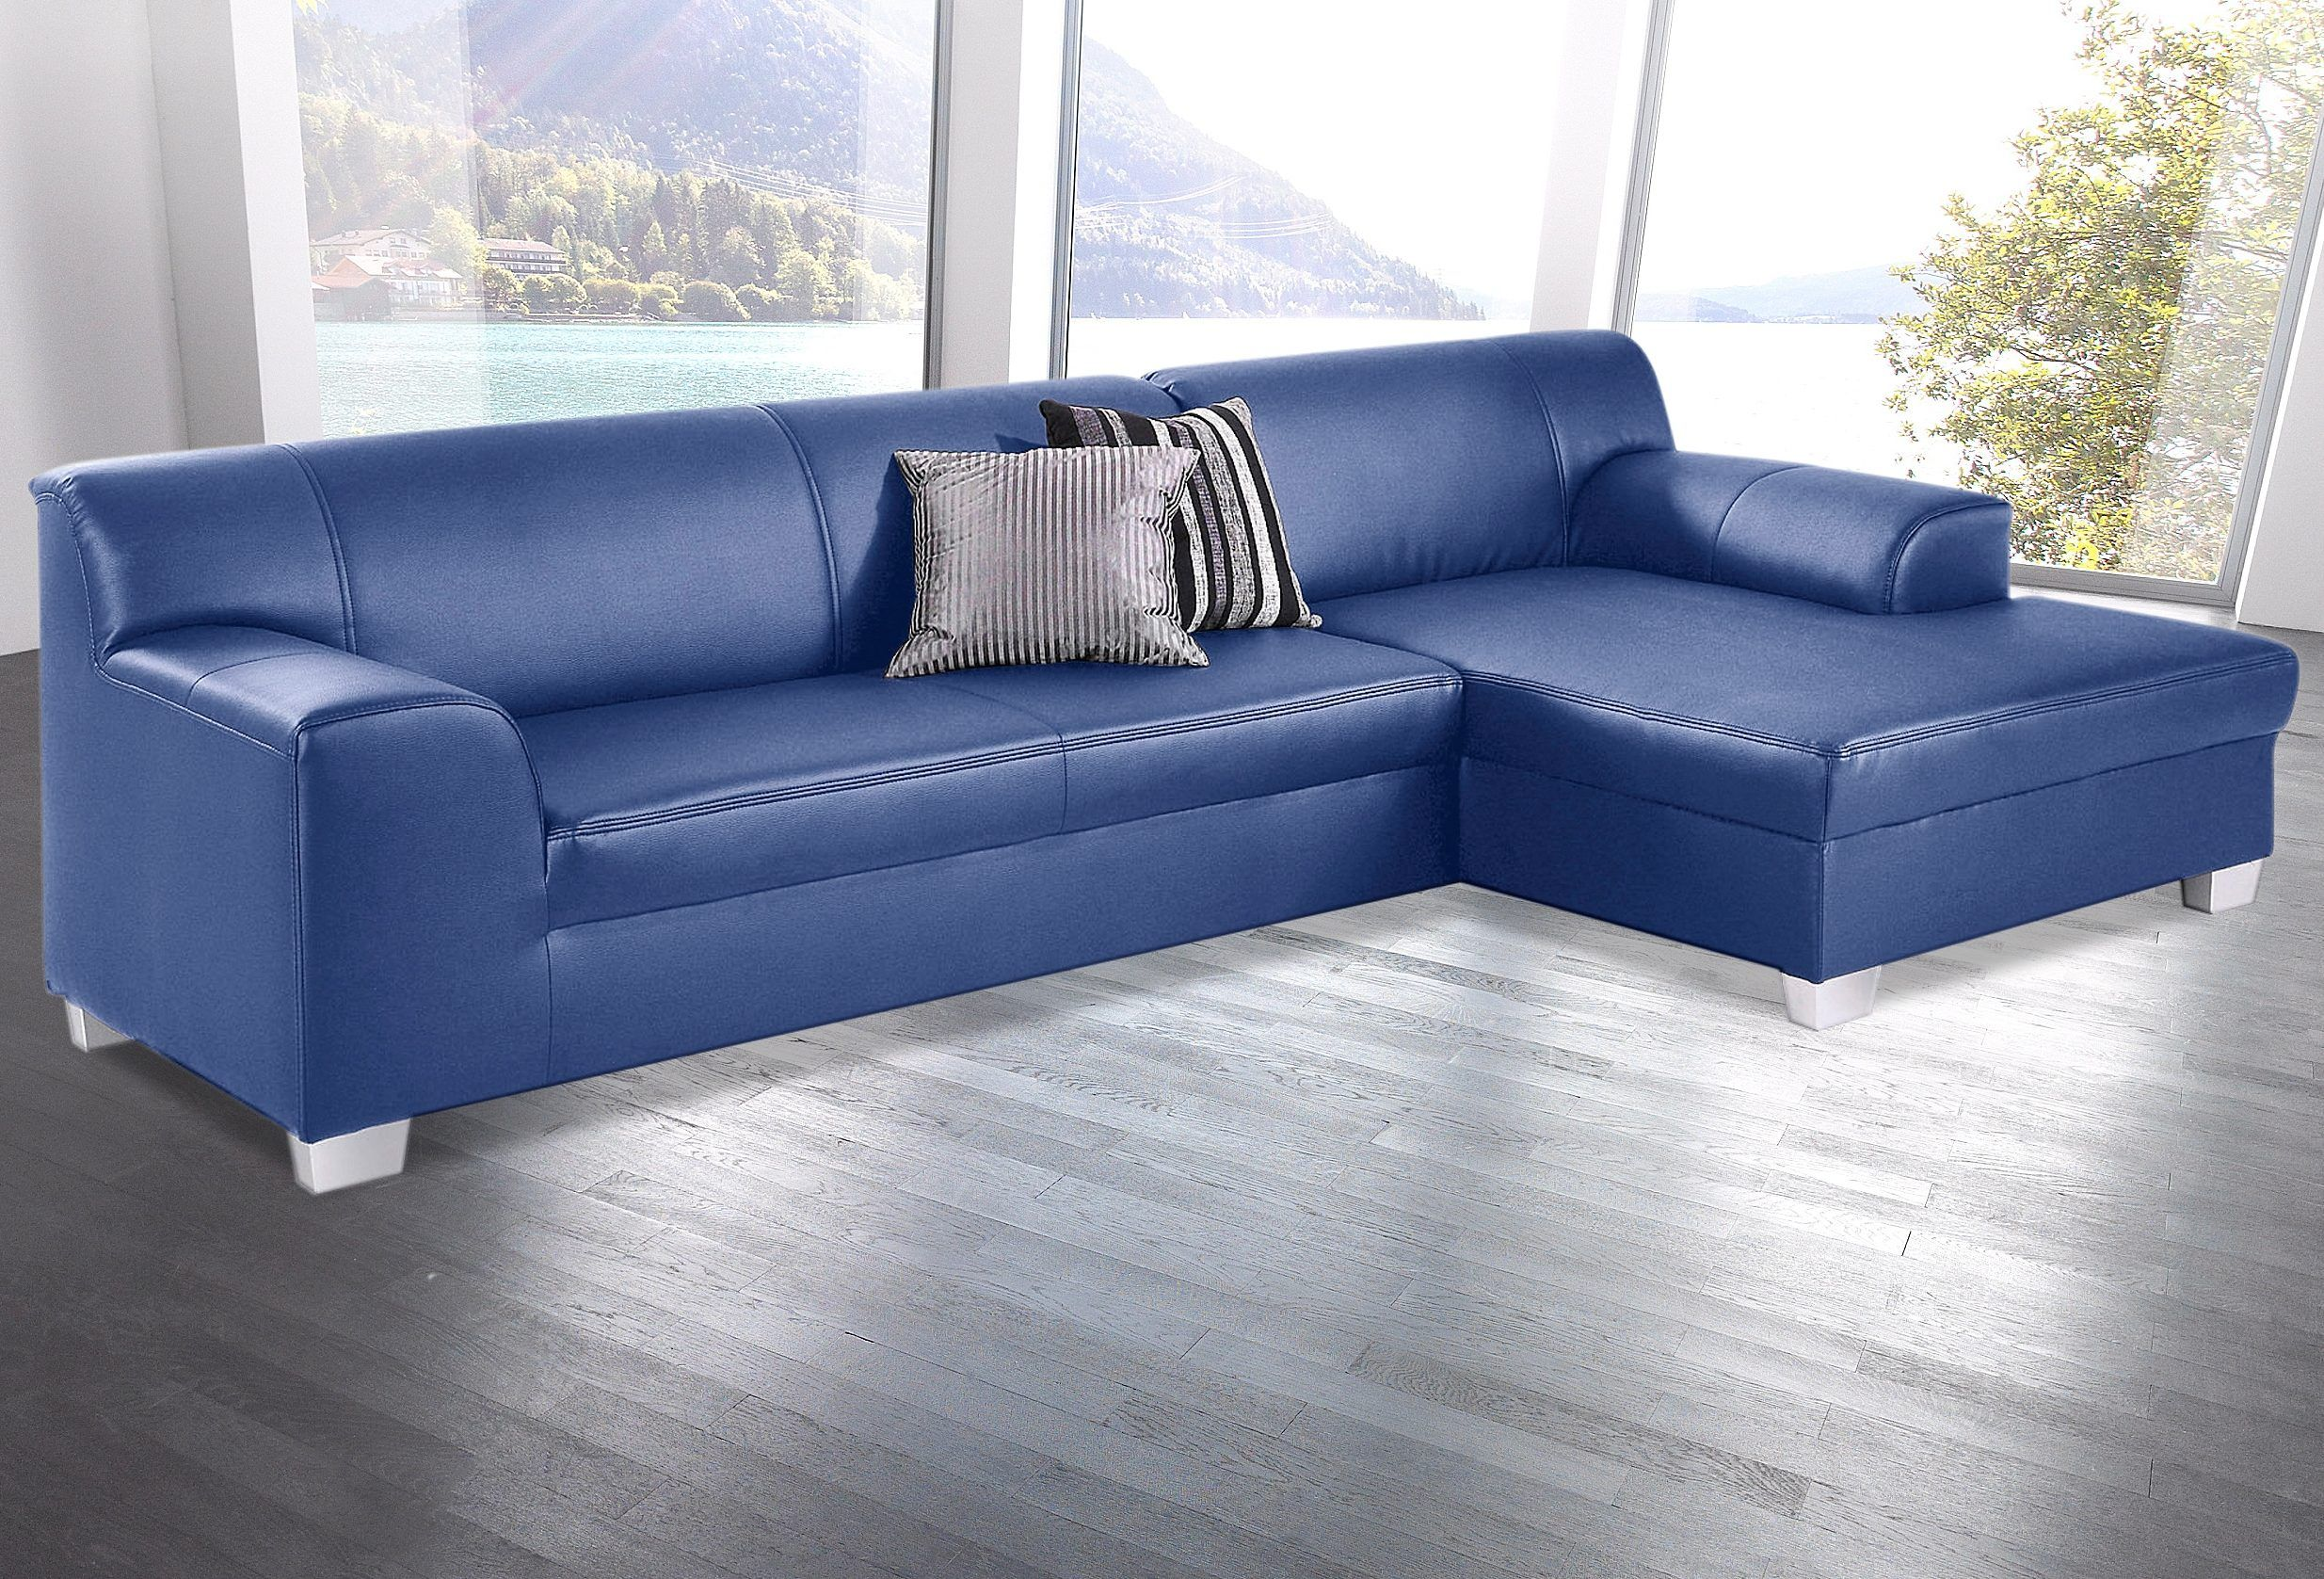 Recamiere Klein. Ecksofa Sofa Couch Recamiere Grau In Rostock With ...